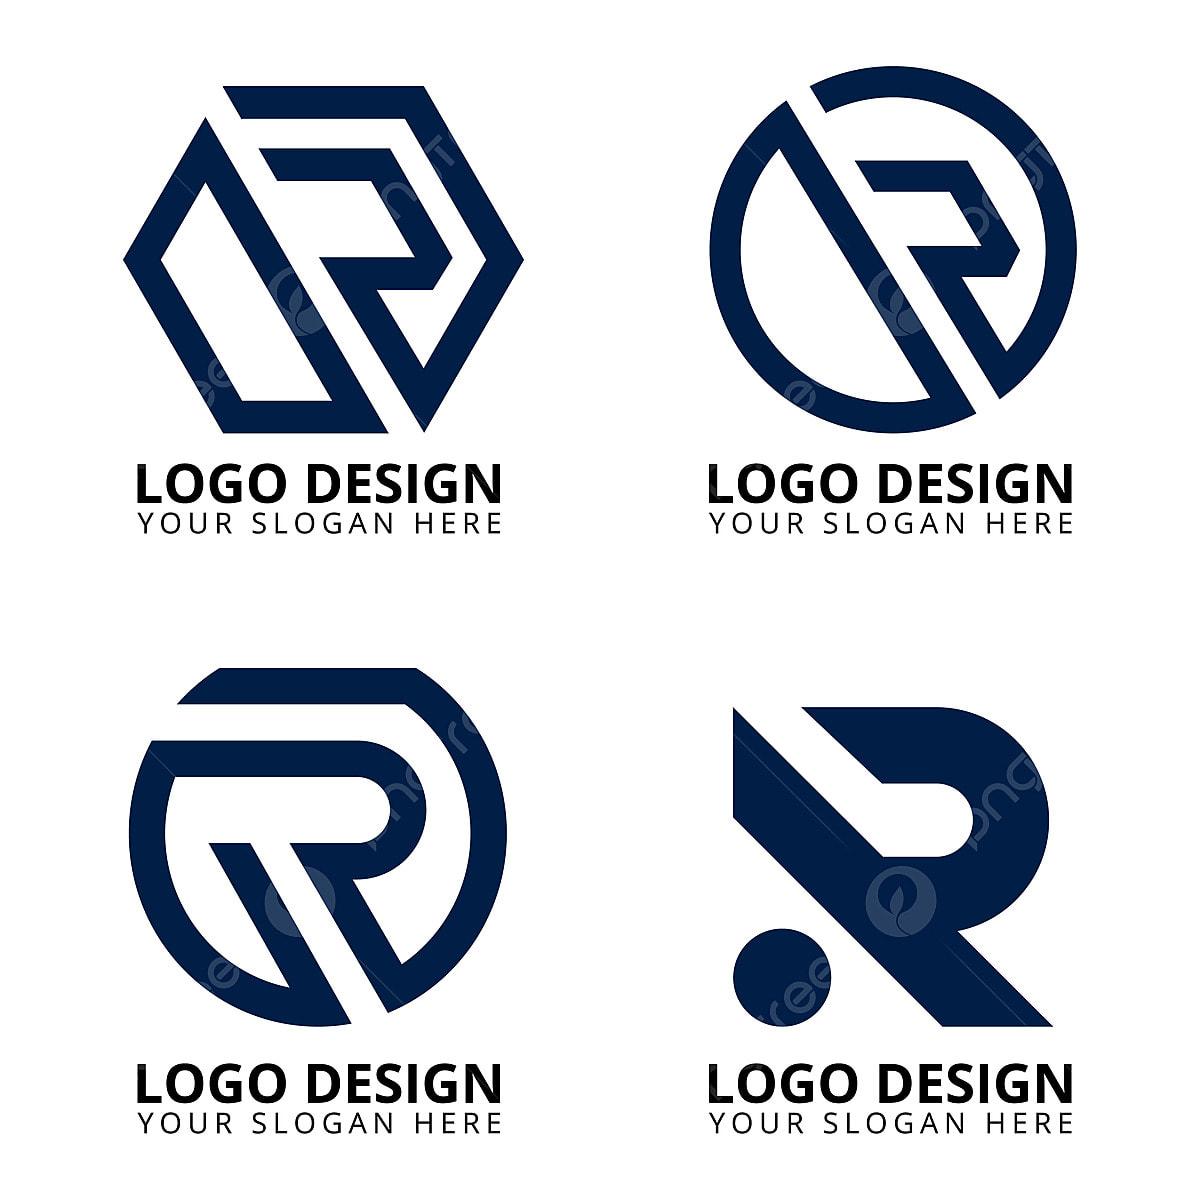 Letter R Modern Logo Design Collection Template Download On Pngtree